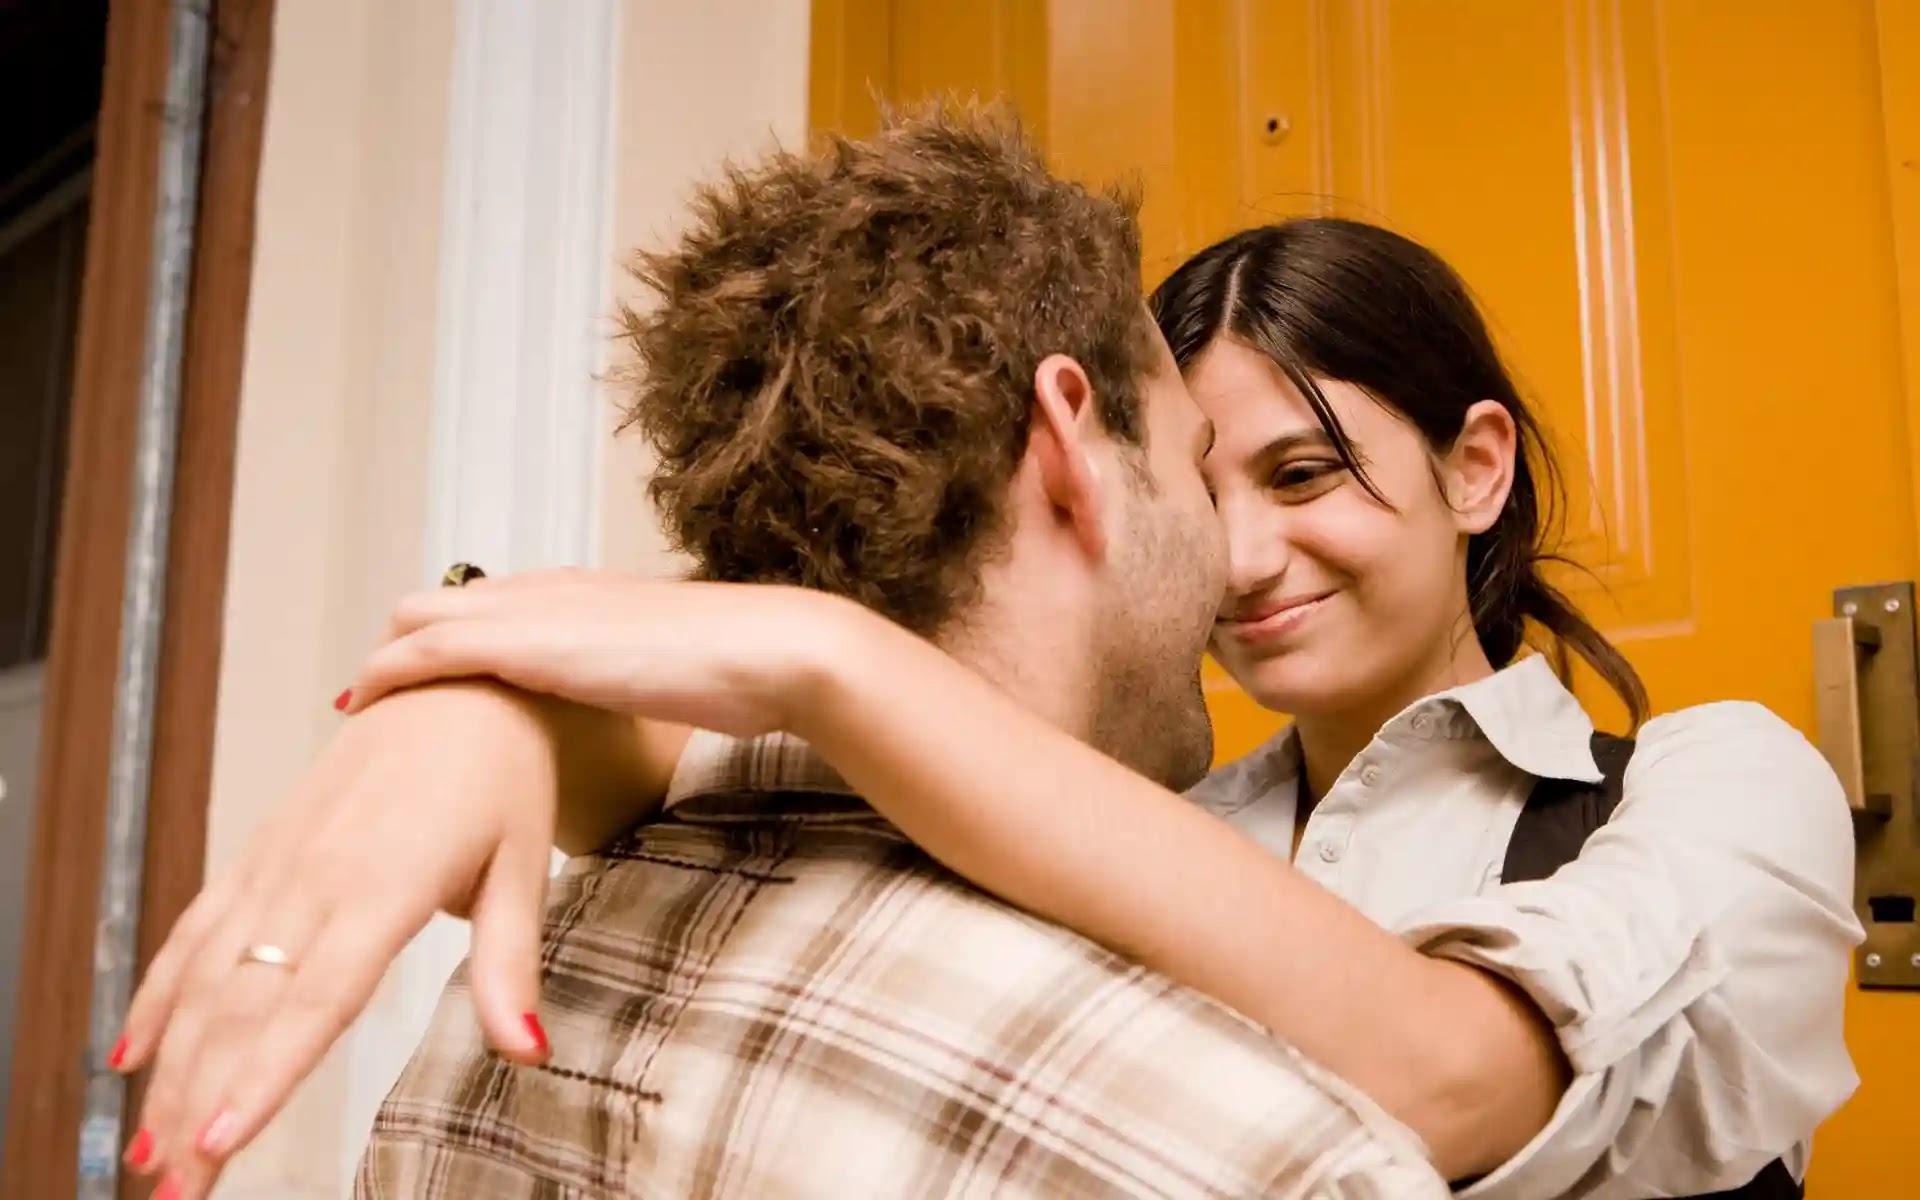 cute romantic couple image